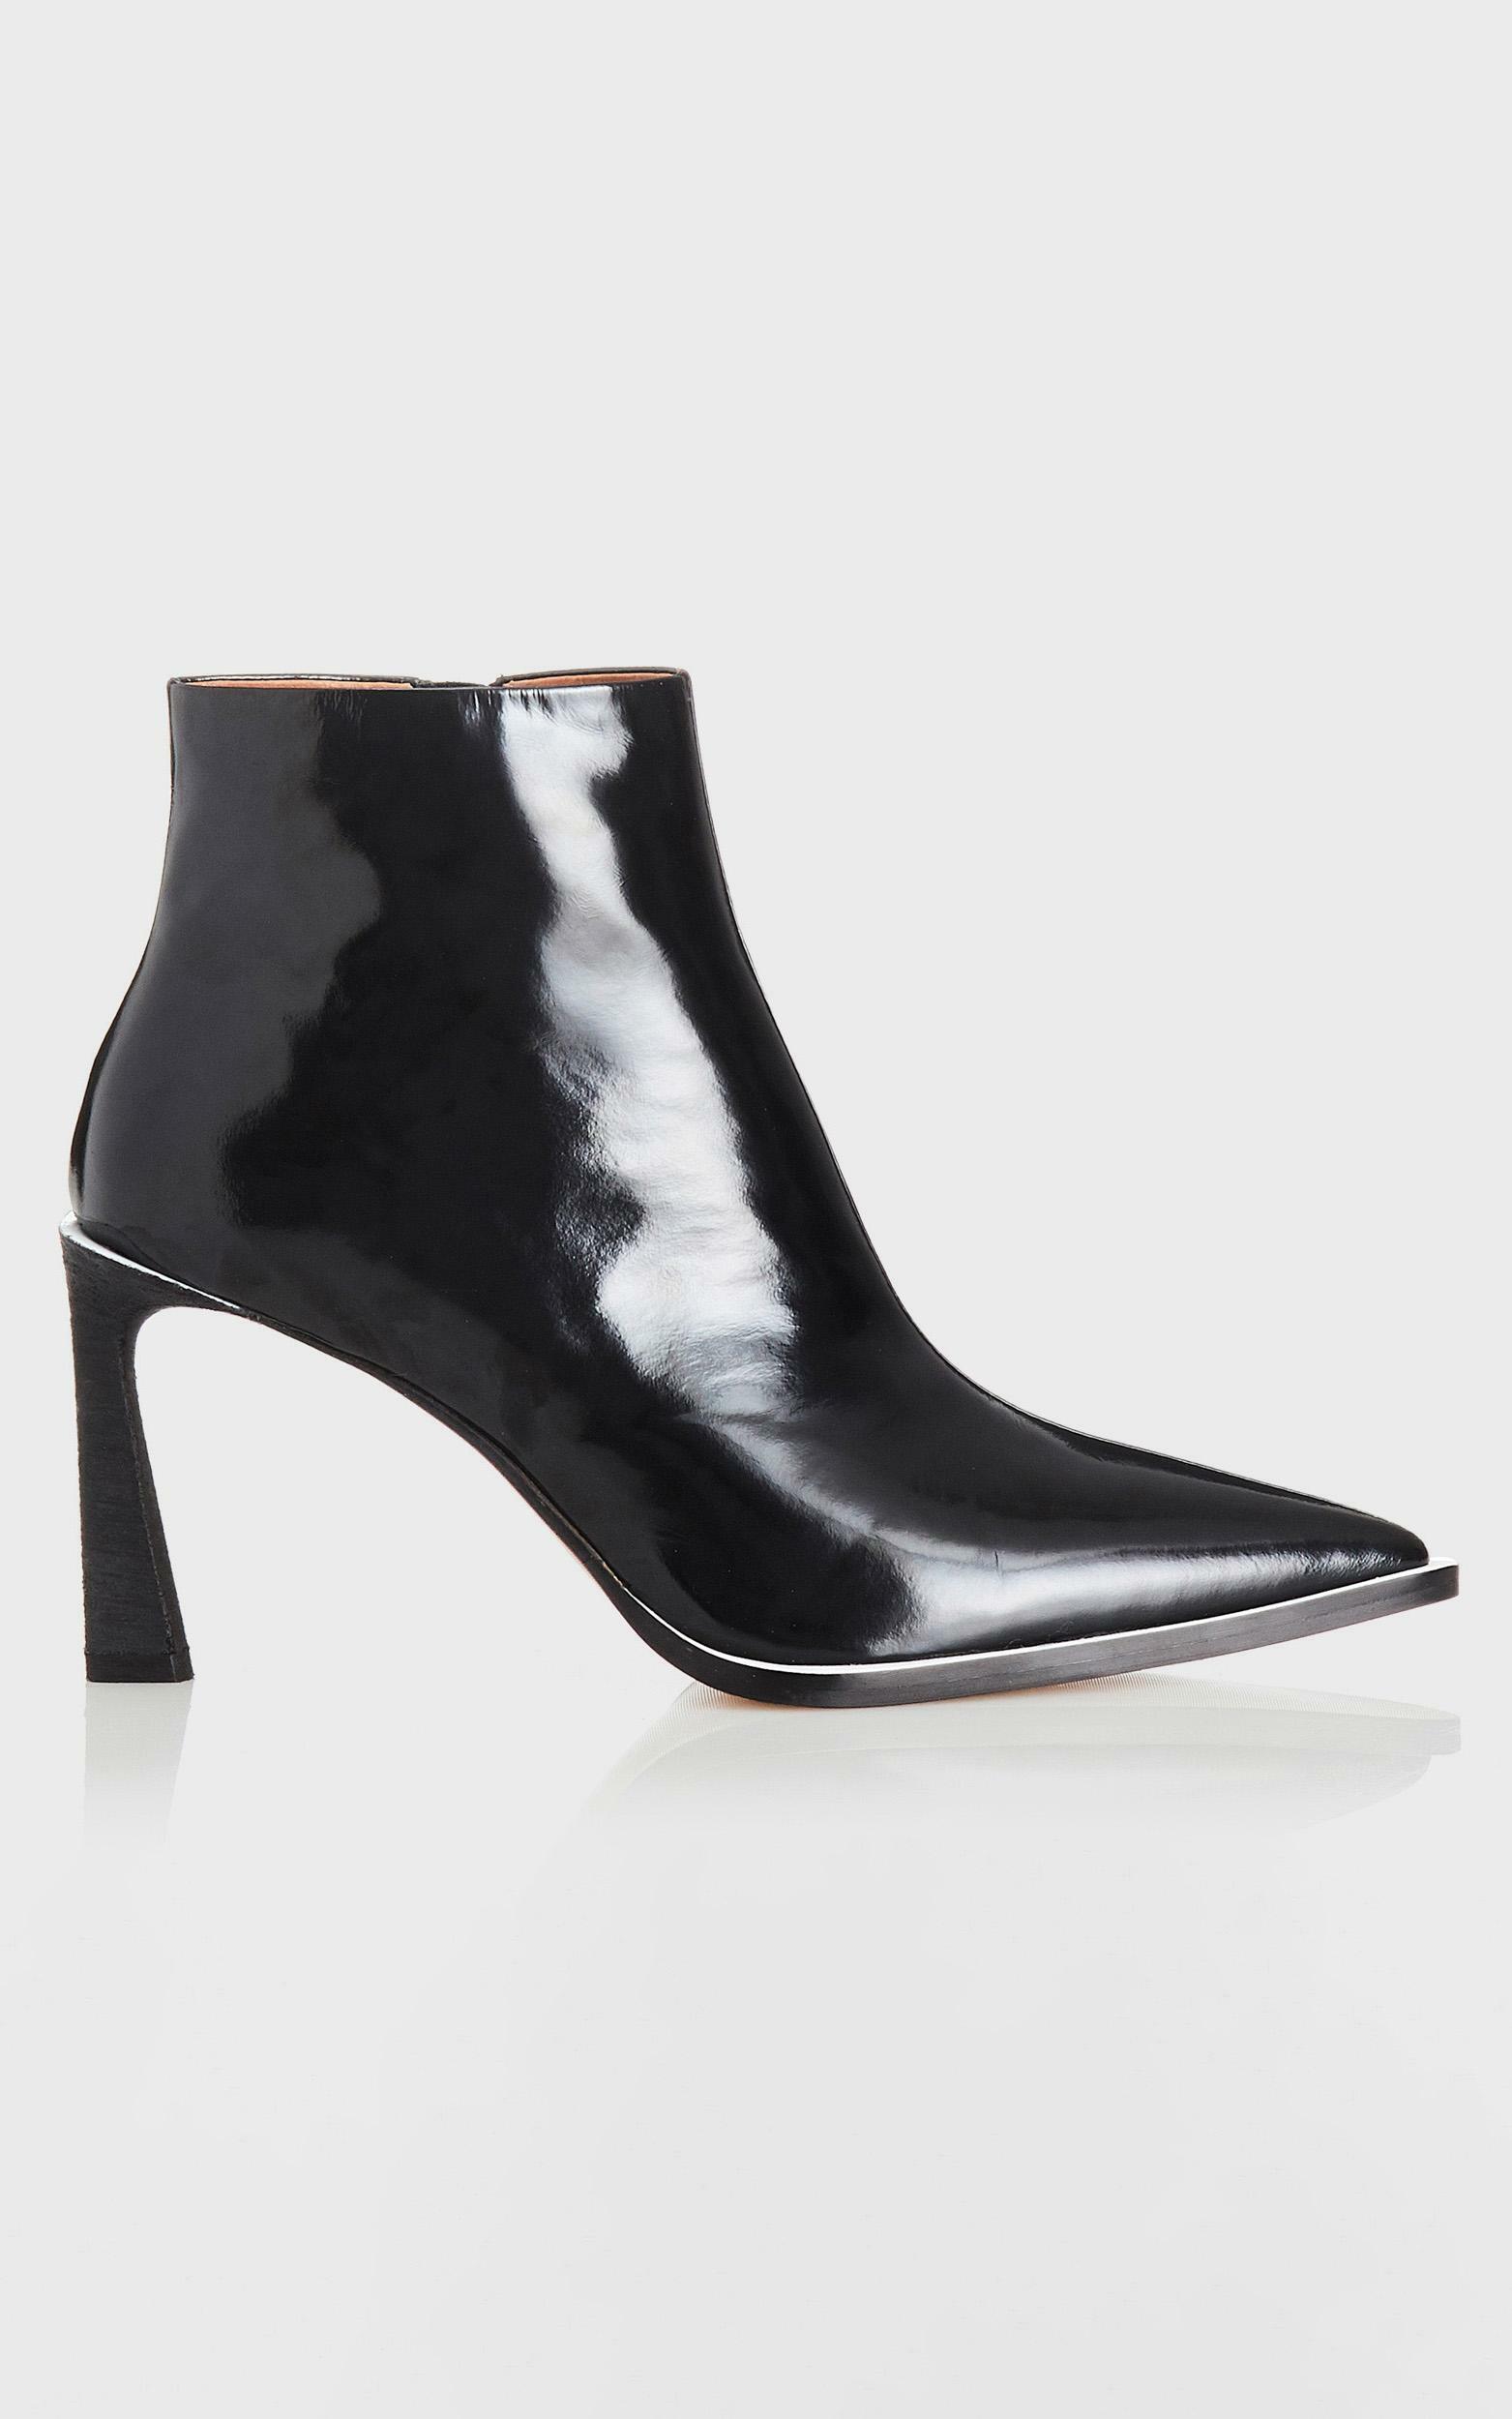 Alias Mae - Zara Boots in Black Box - 5.5, BLK1, hi-res image number null